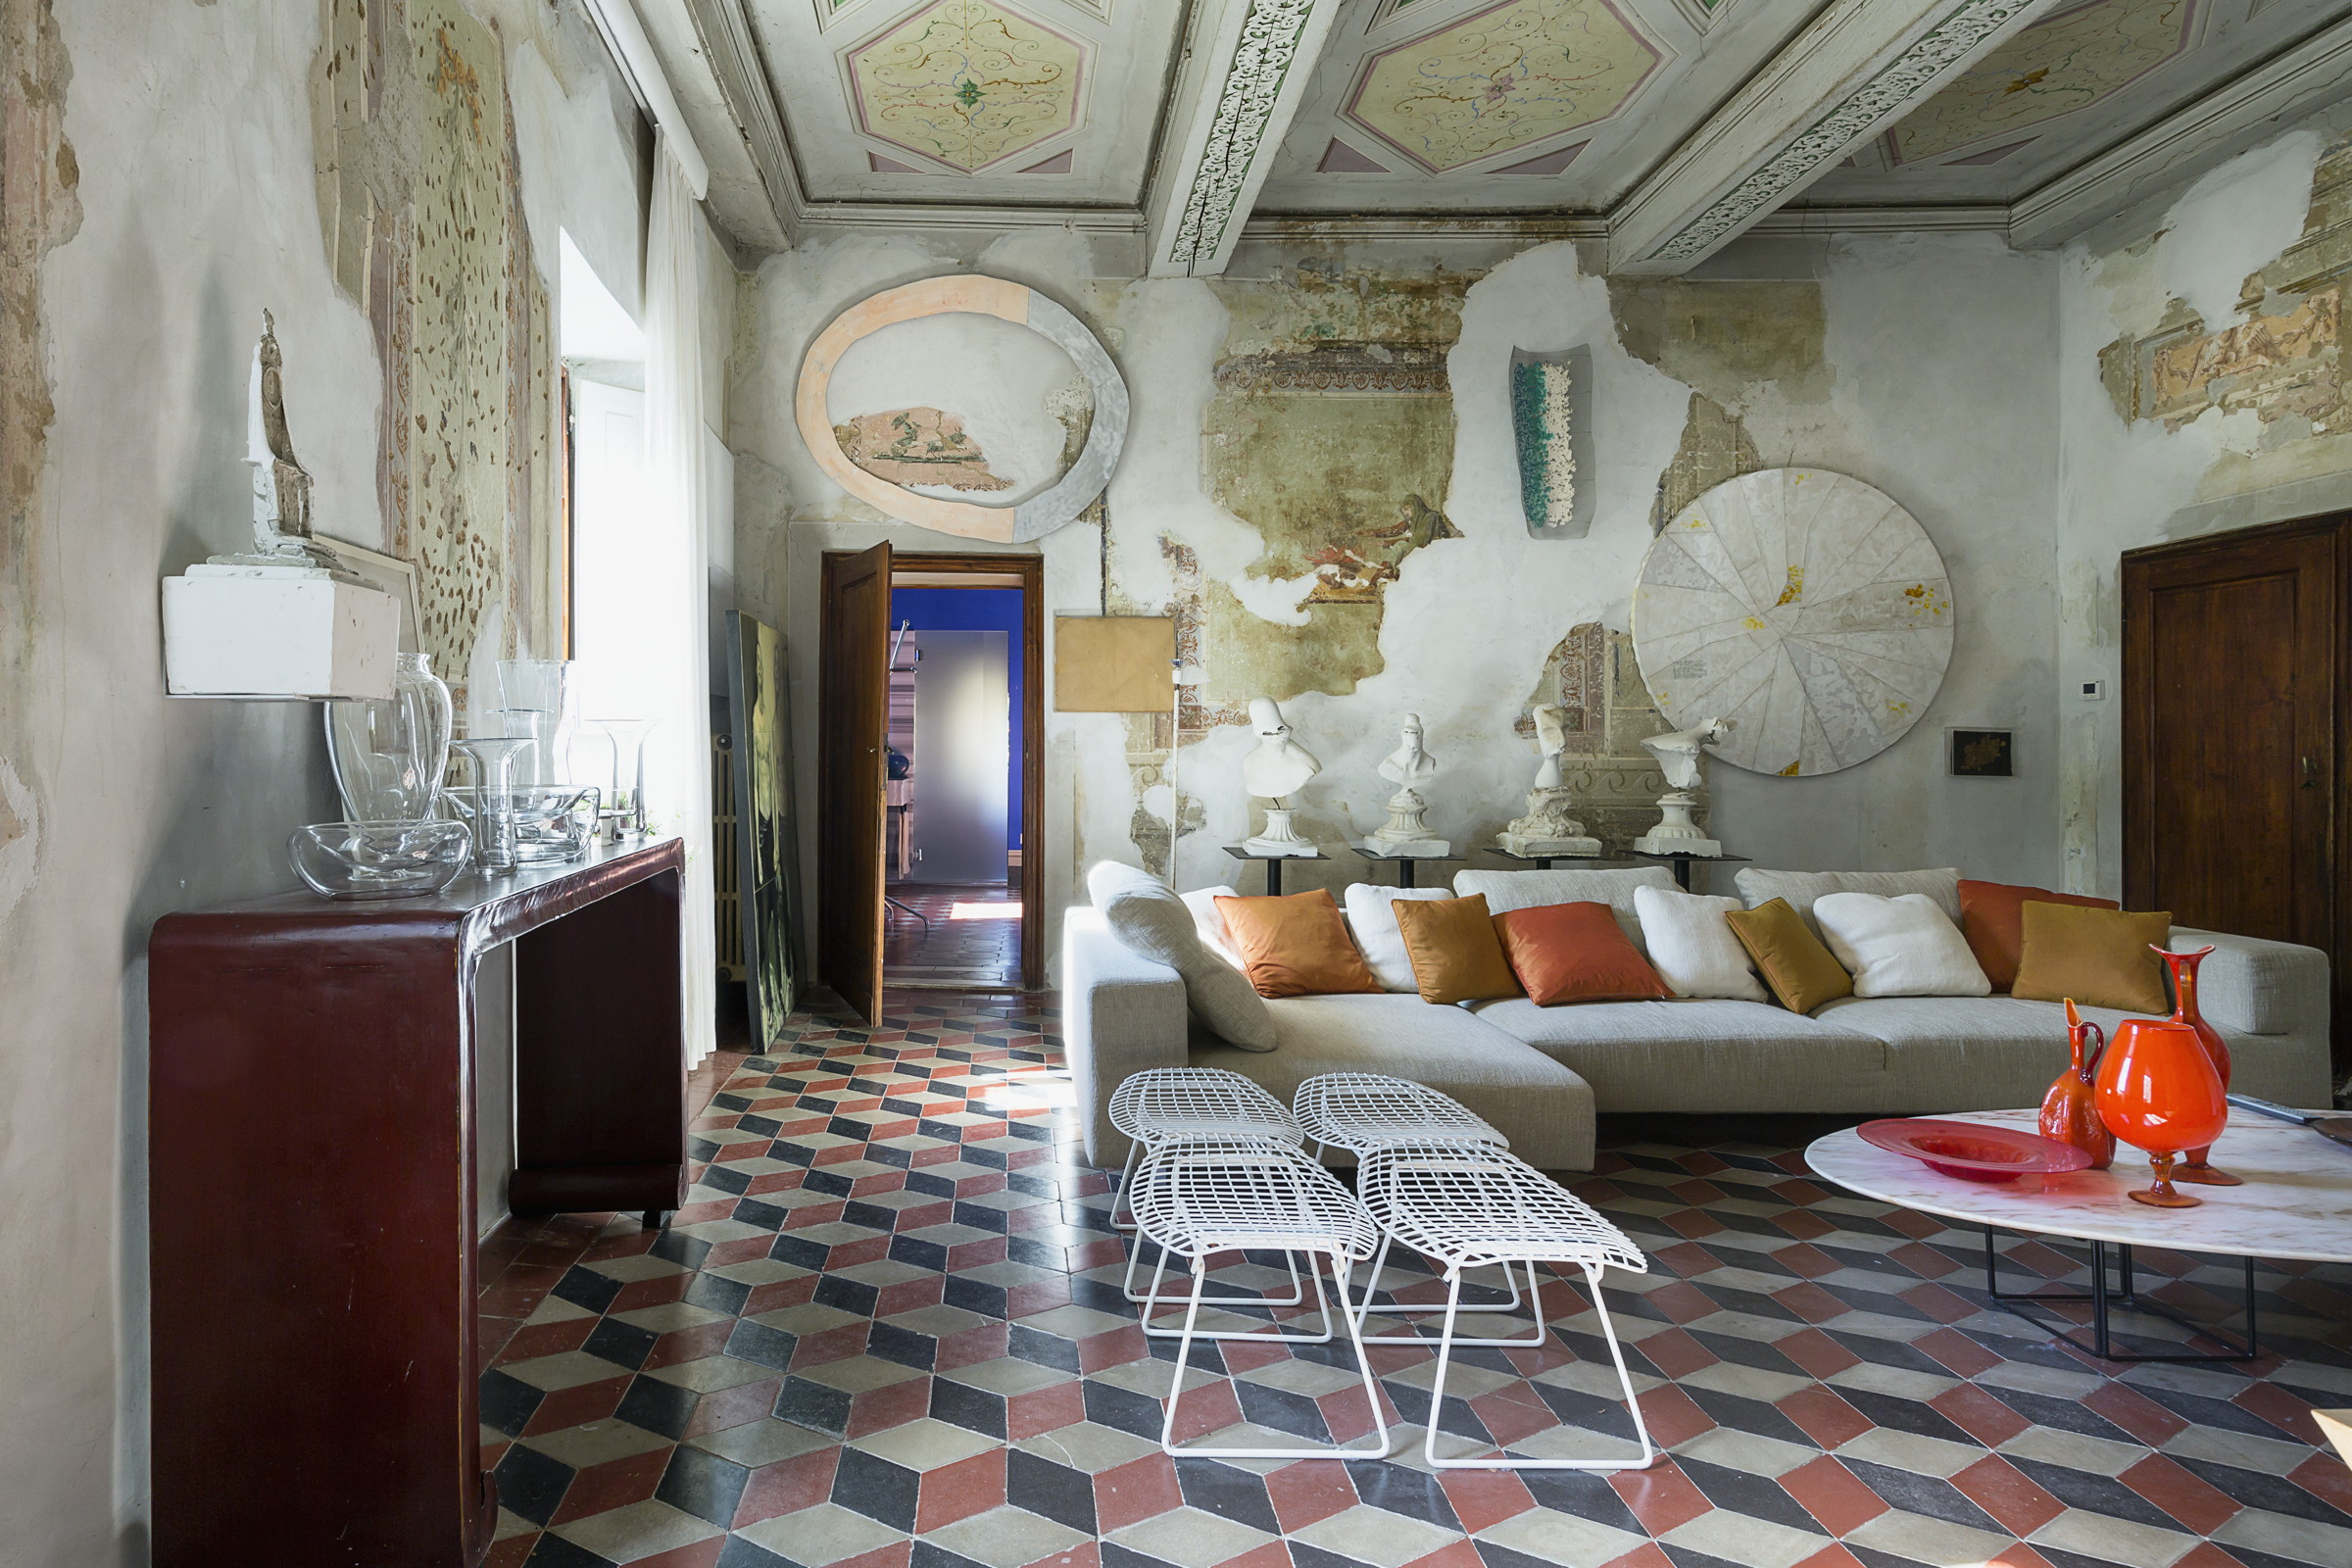 The living room of Villa Gaeta. Photo © Francesca Anichini